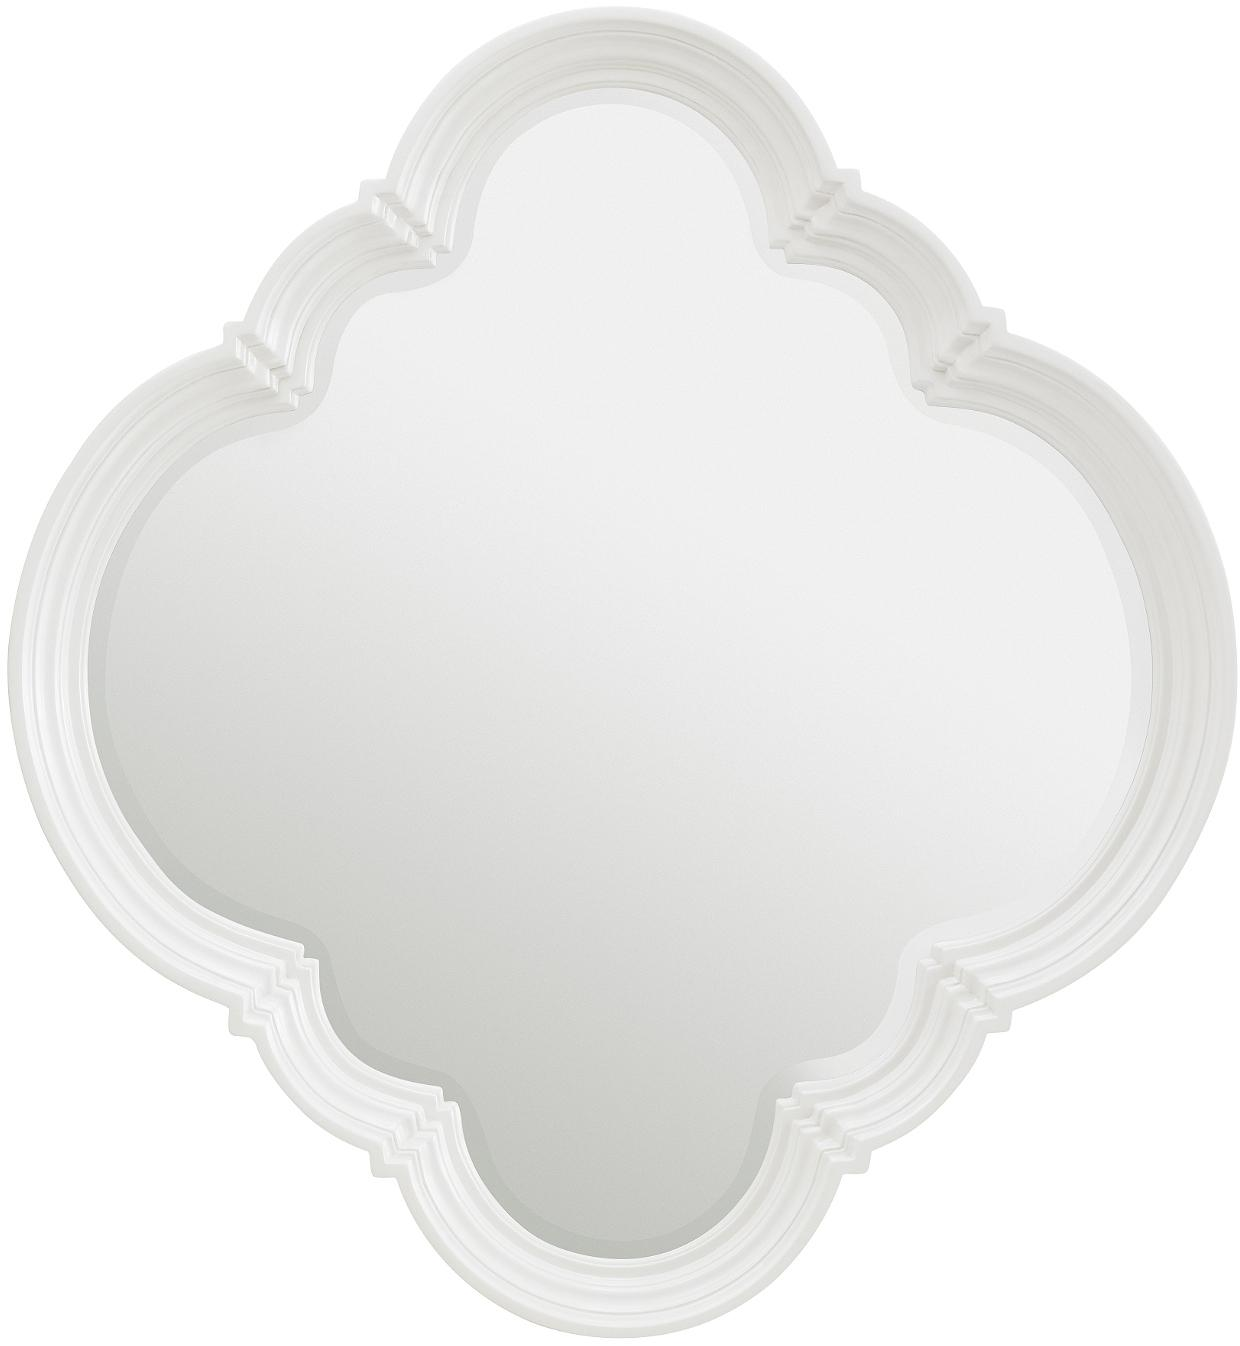 Stanley Furniture Charleston Regency Quatrefoil Mirror - Item Number: 302-23-33